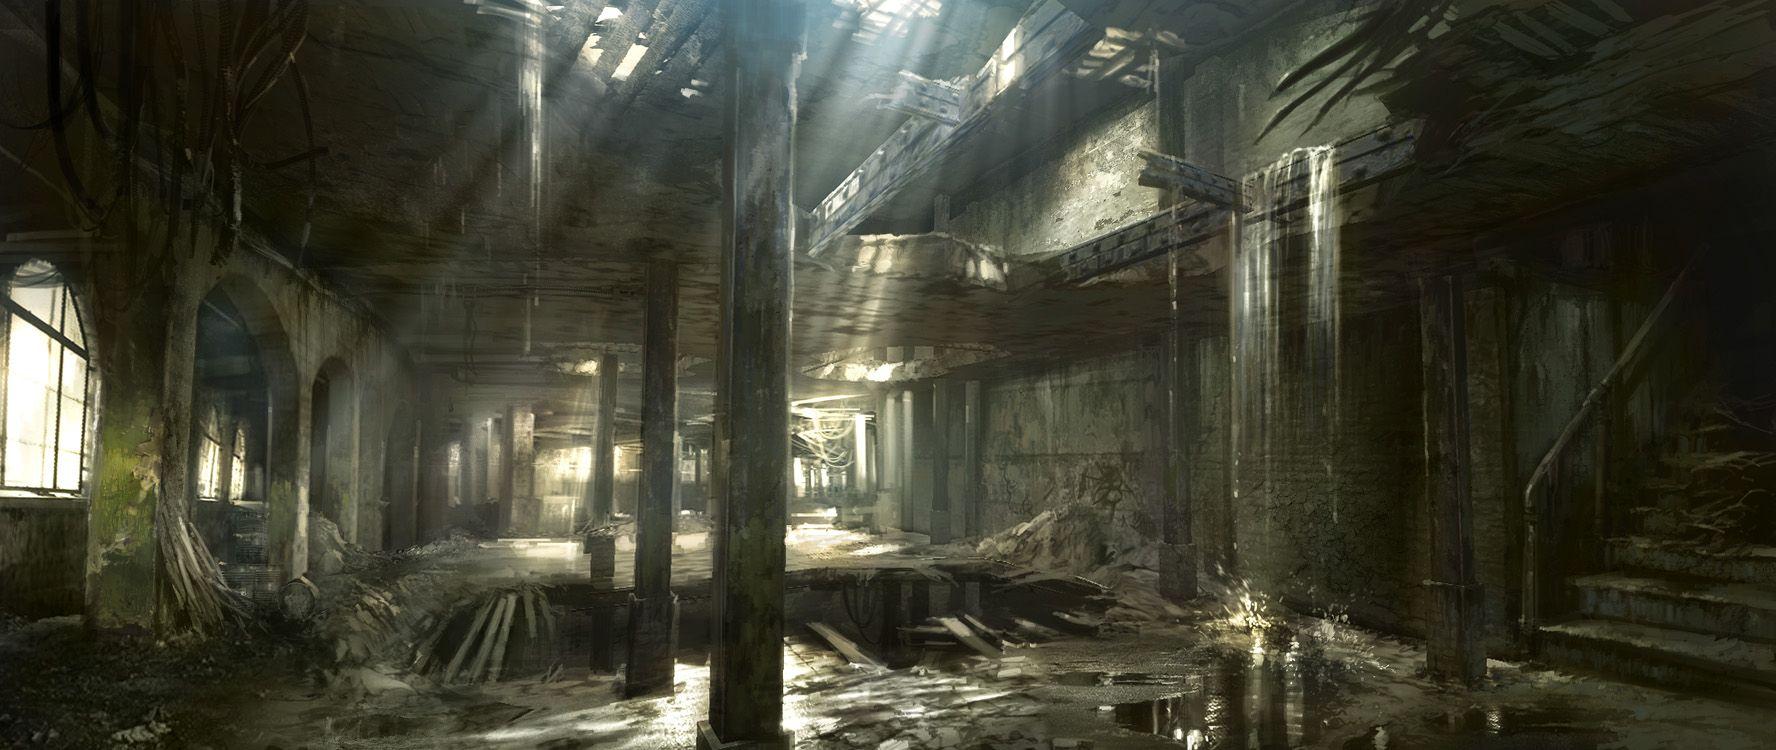 Interior Devastation by atomhawk.deviantart.com on @deviantART